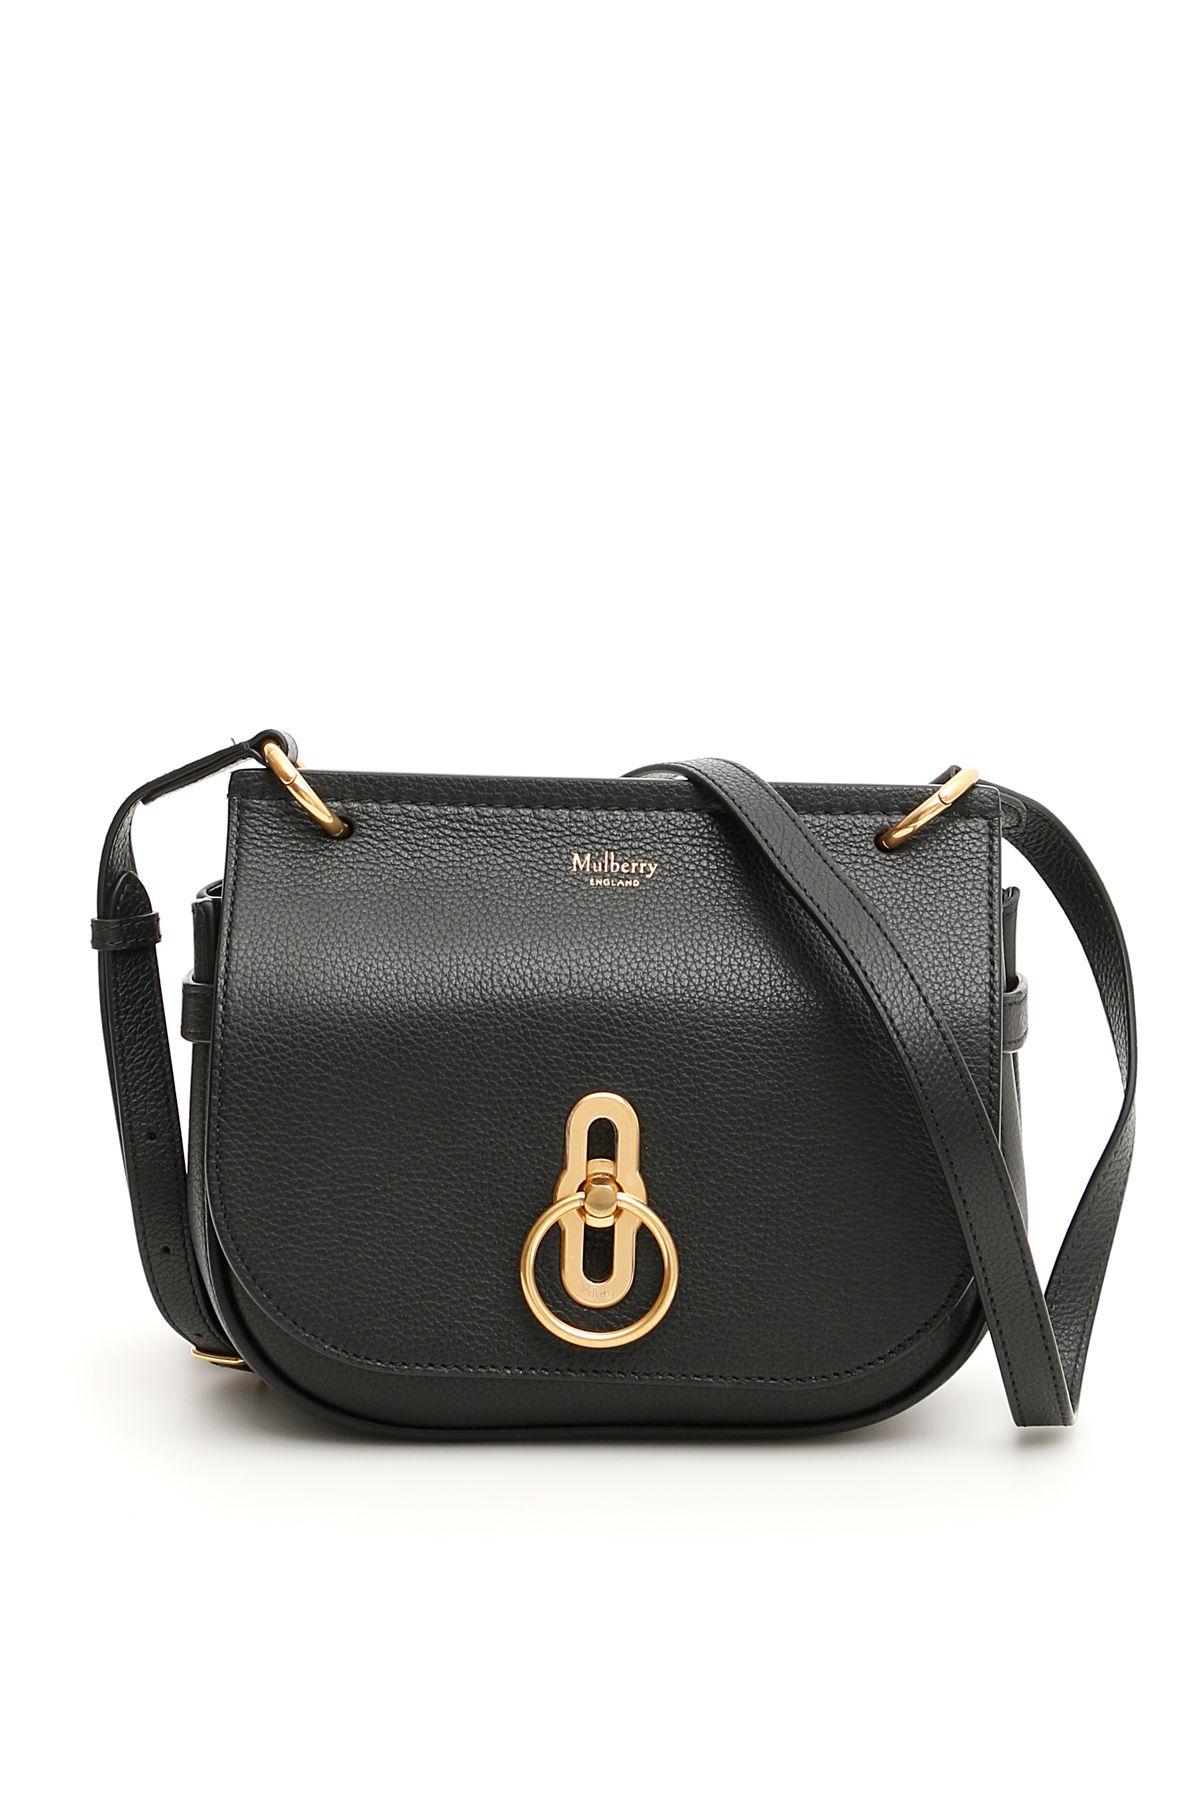 Amberley Small Bag in Black